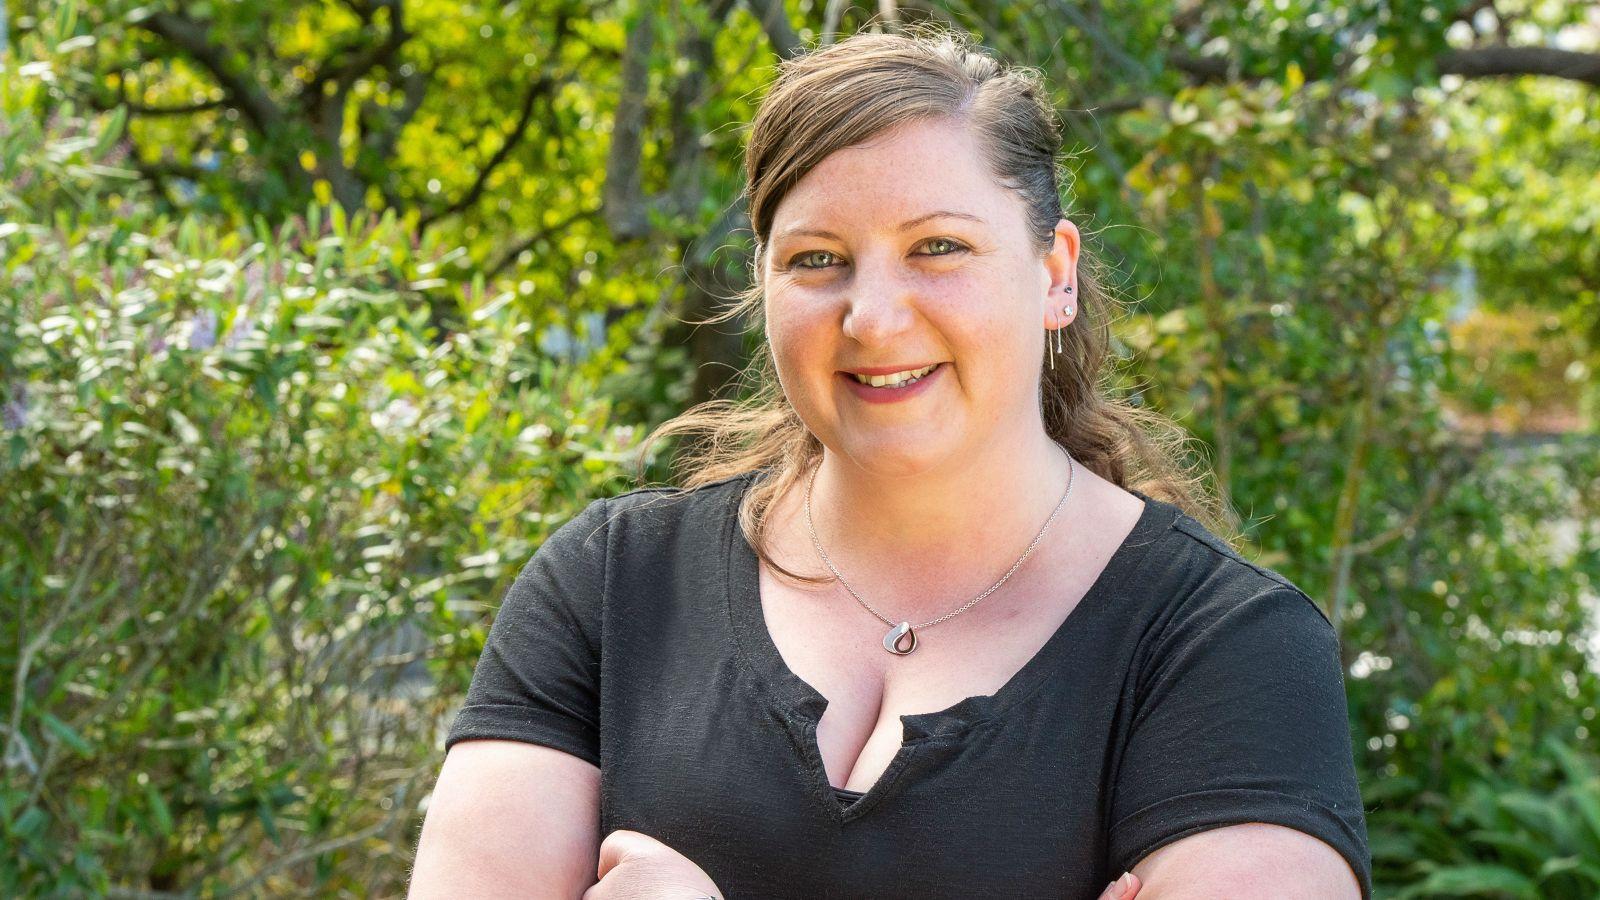 PhD Candidate Michaela Pettie